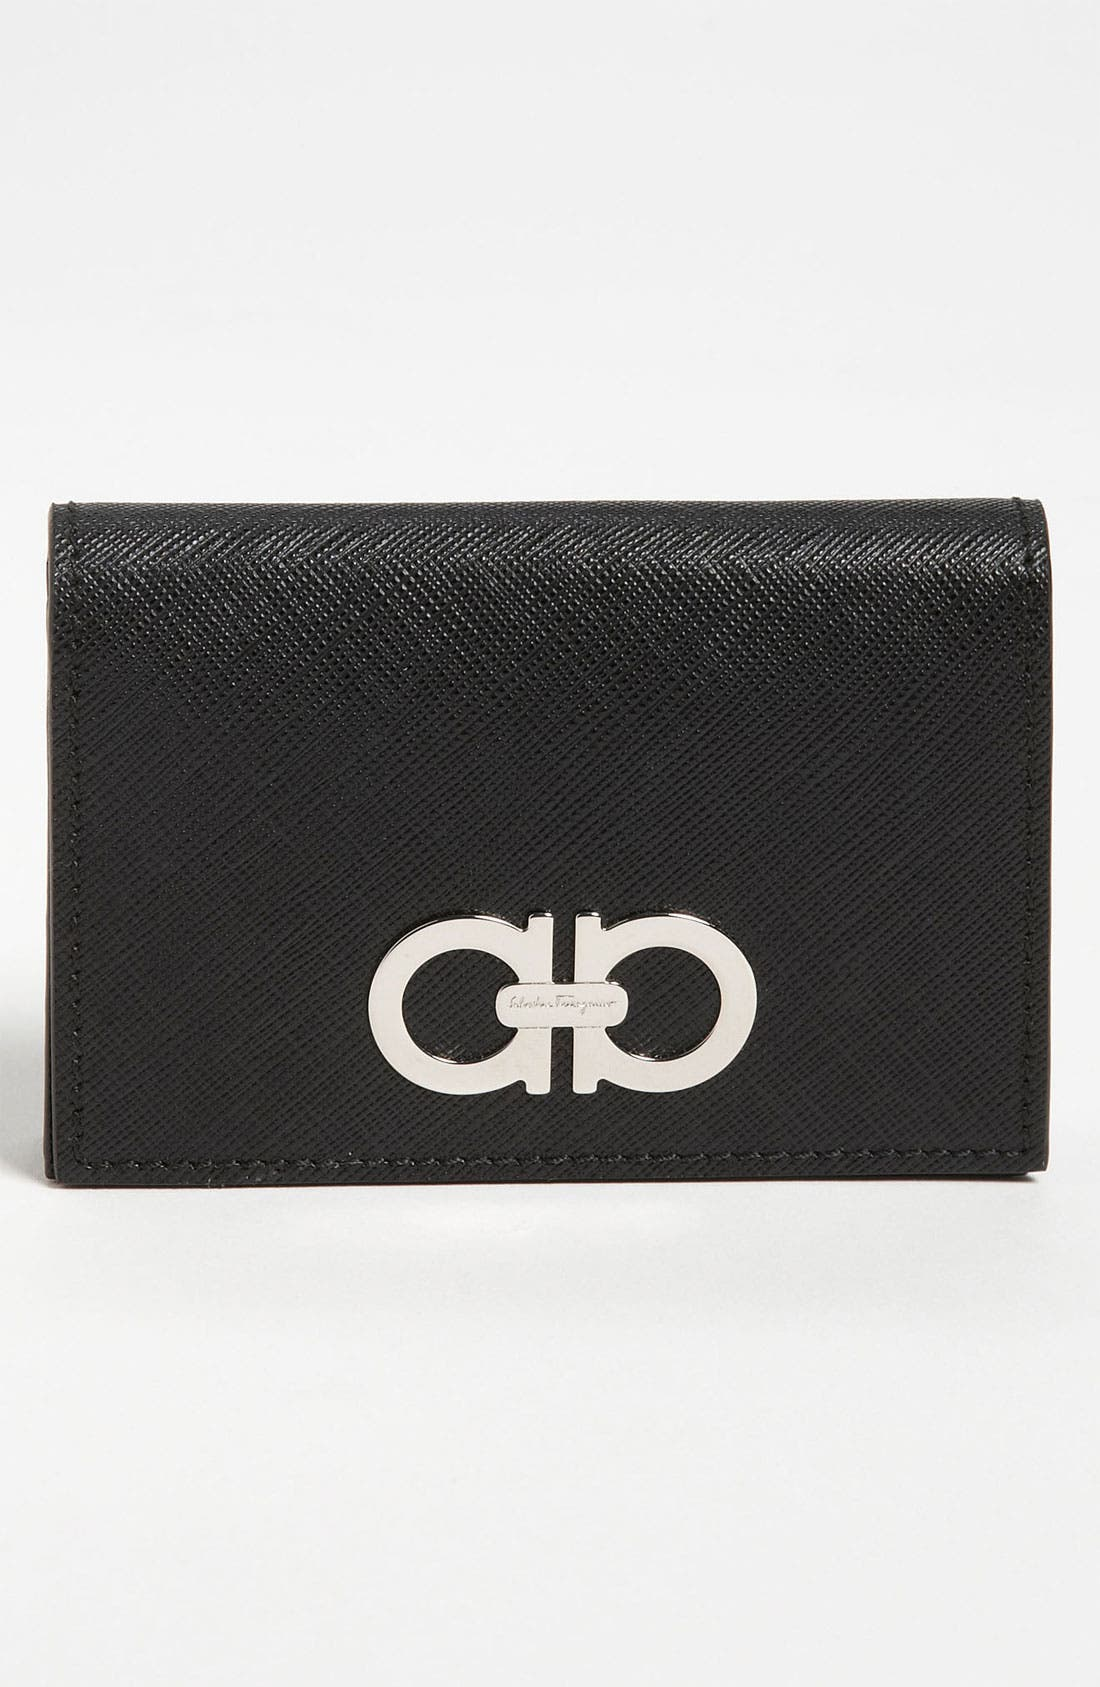 Alternate Image 1 Selected - Salvatore Ferragamo 'Gancini Icona' Leather Card Case